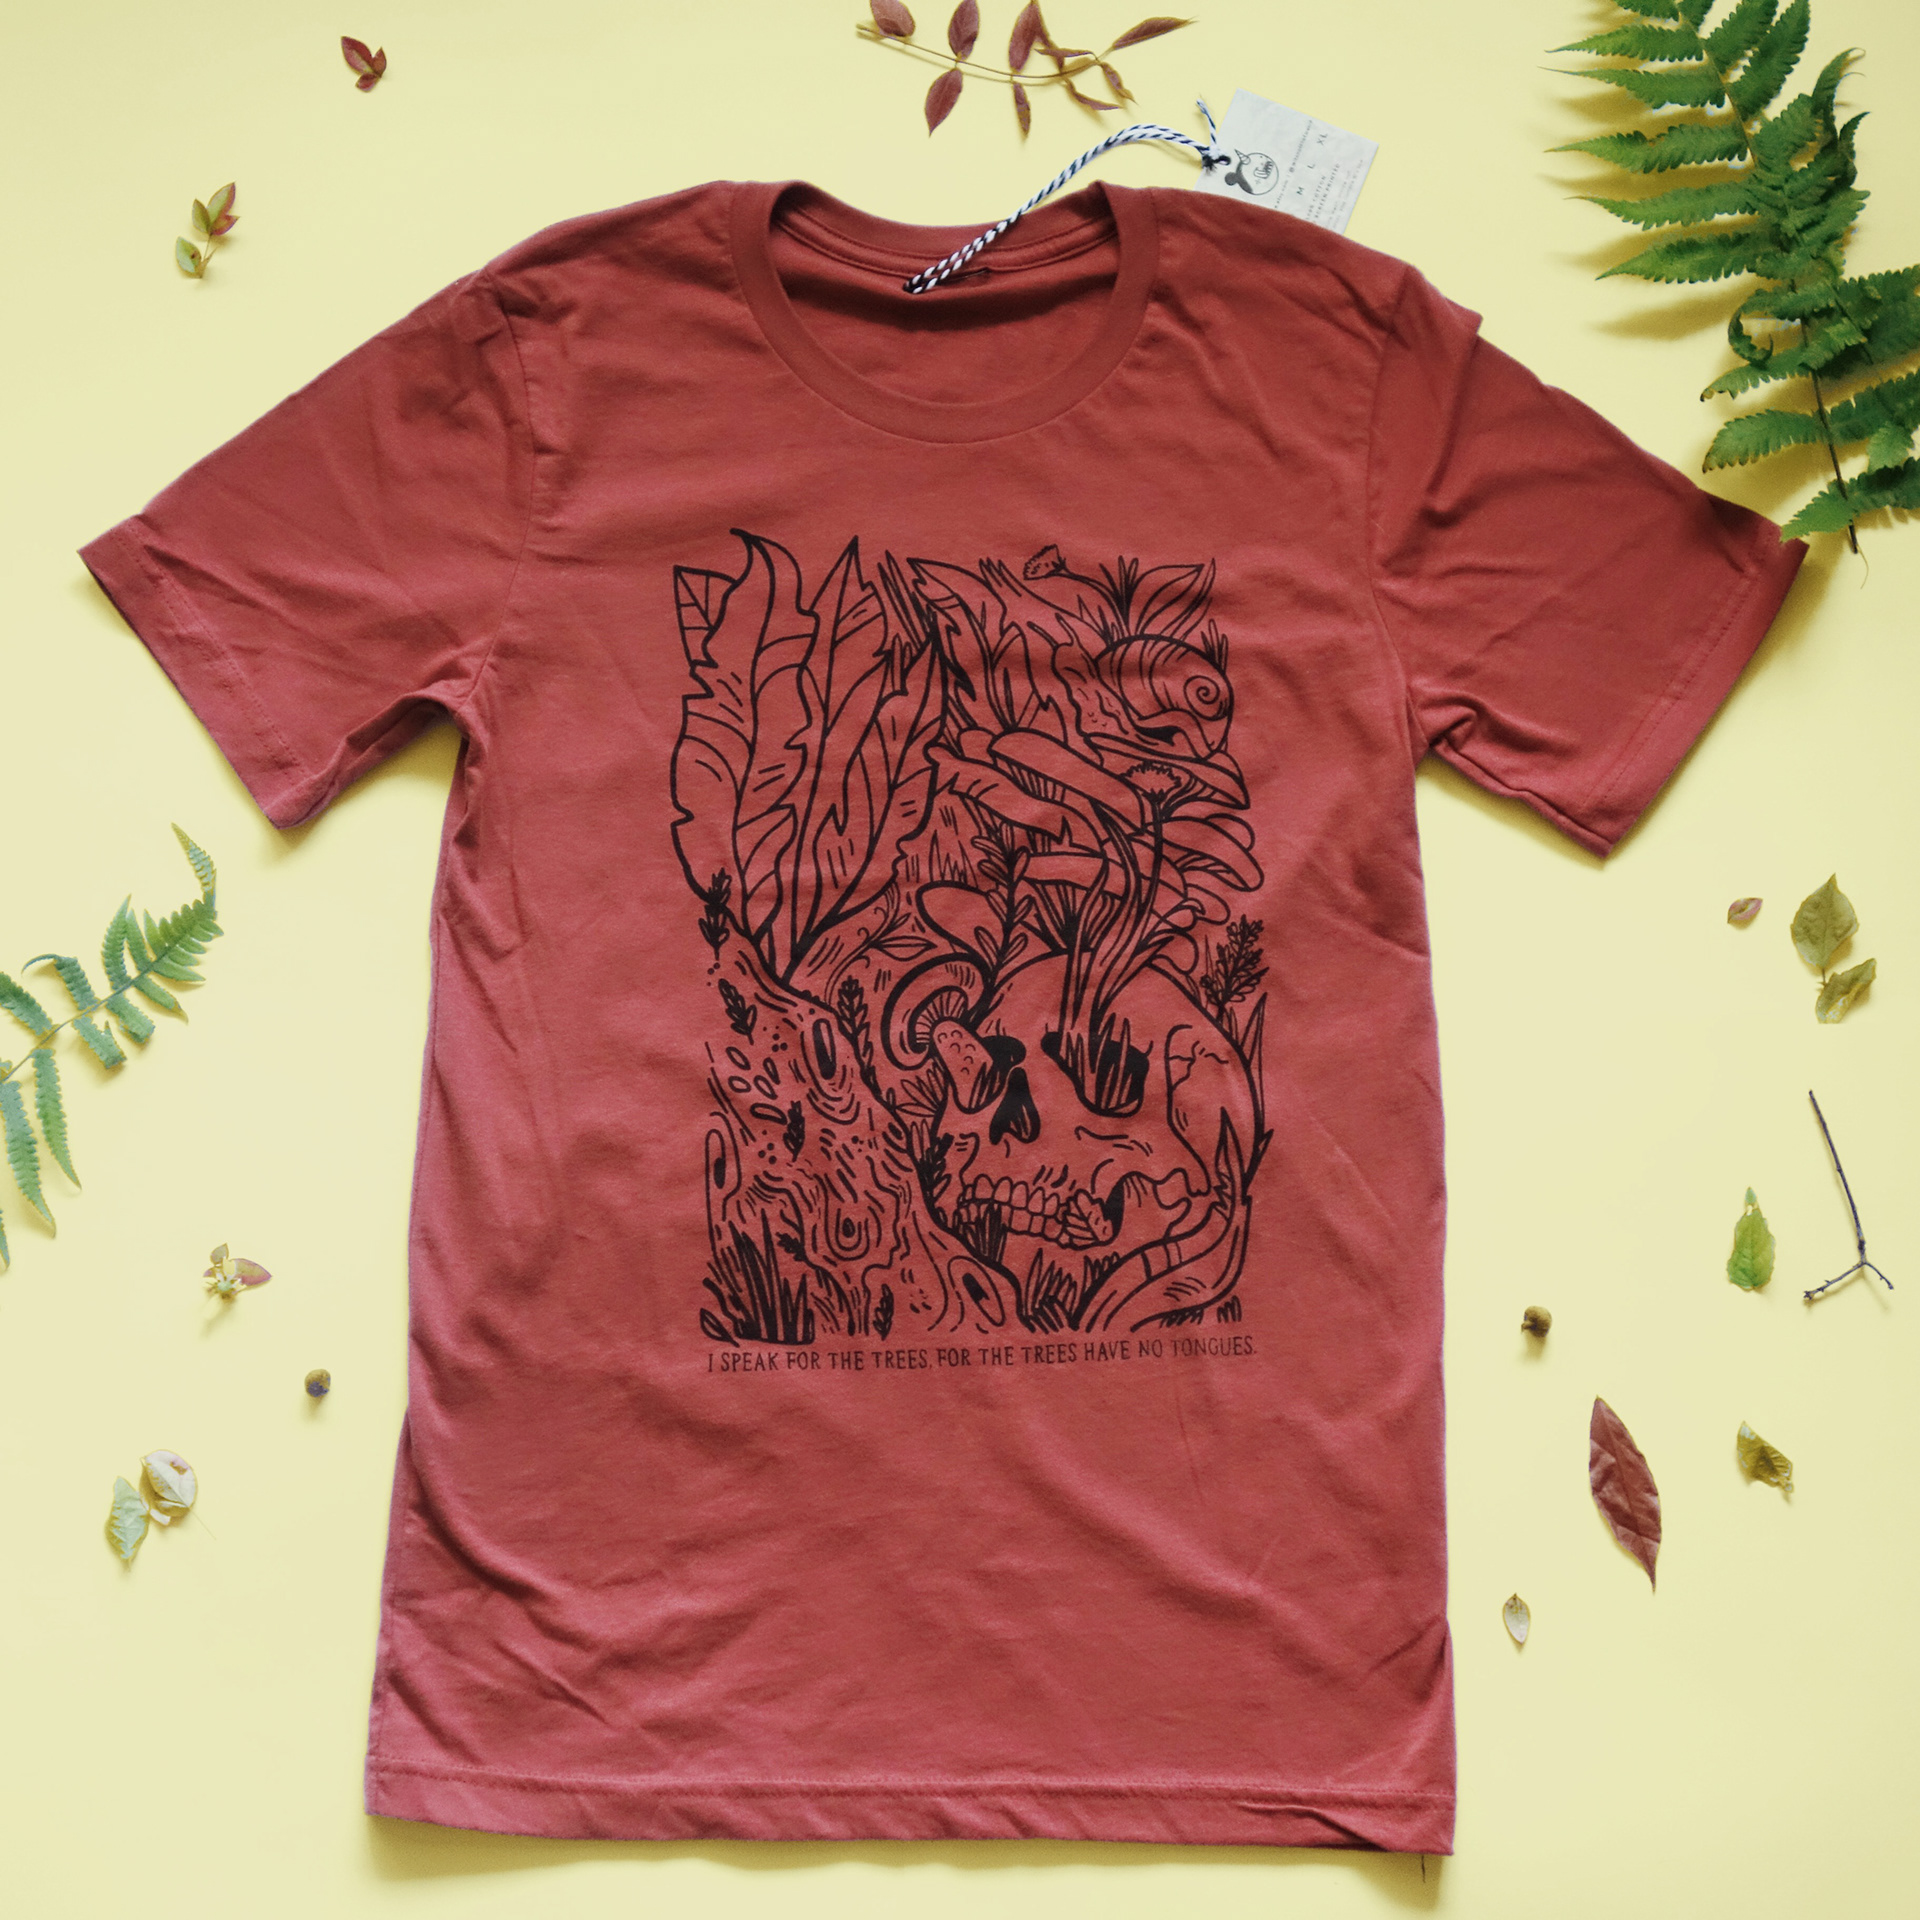 Carly Berry Illustrator Graphic Designer Tshirt Design